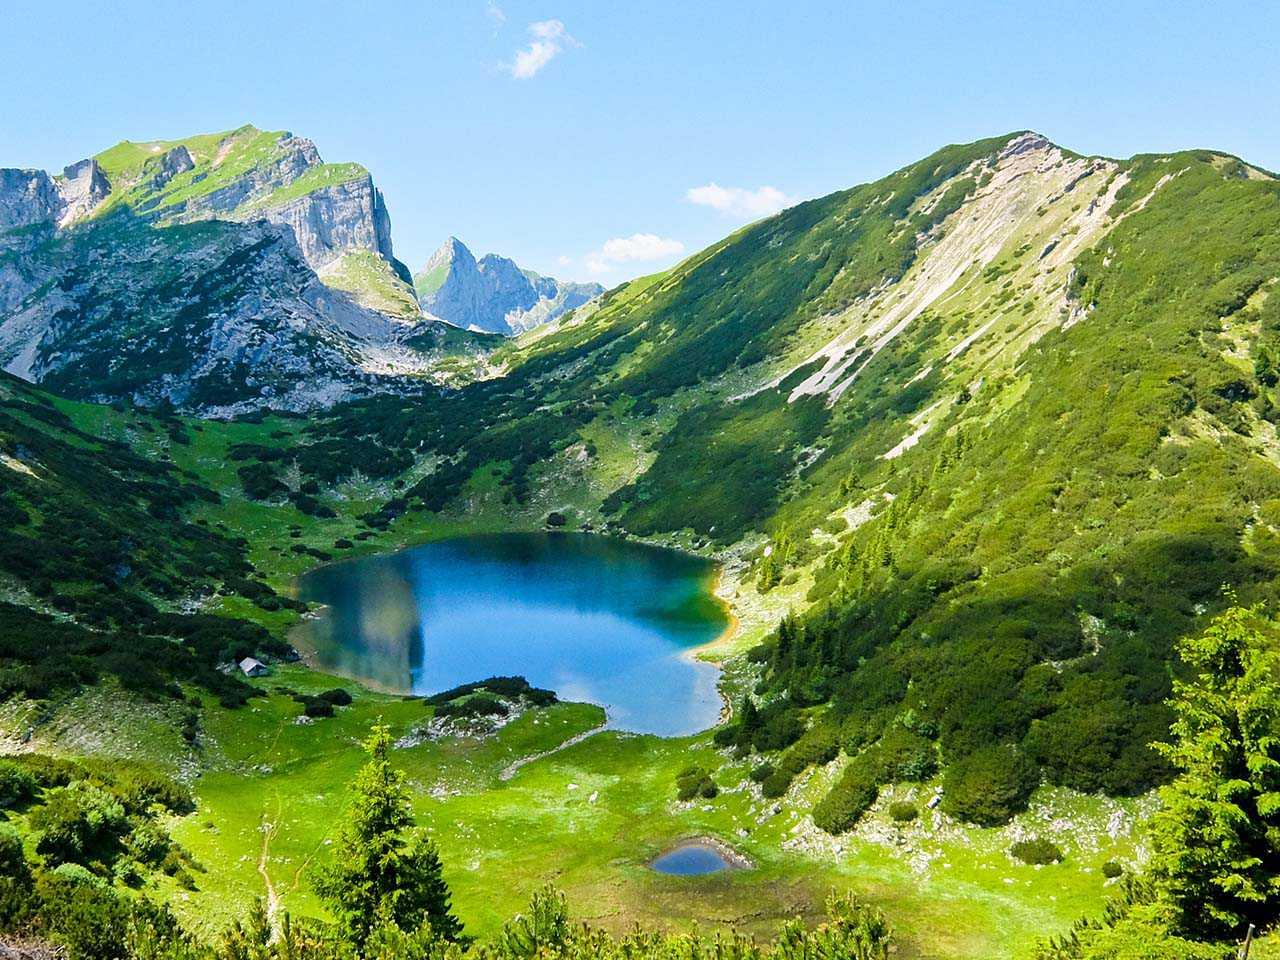 Brandenberg Alps, Tyrol - Zireiner See